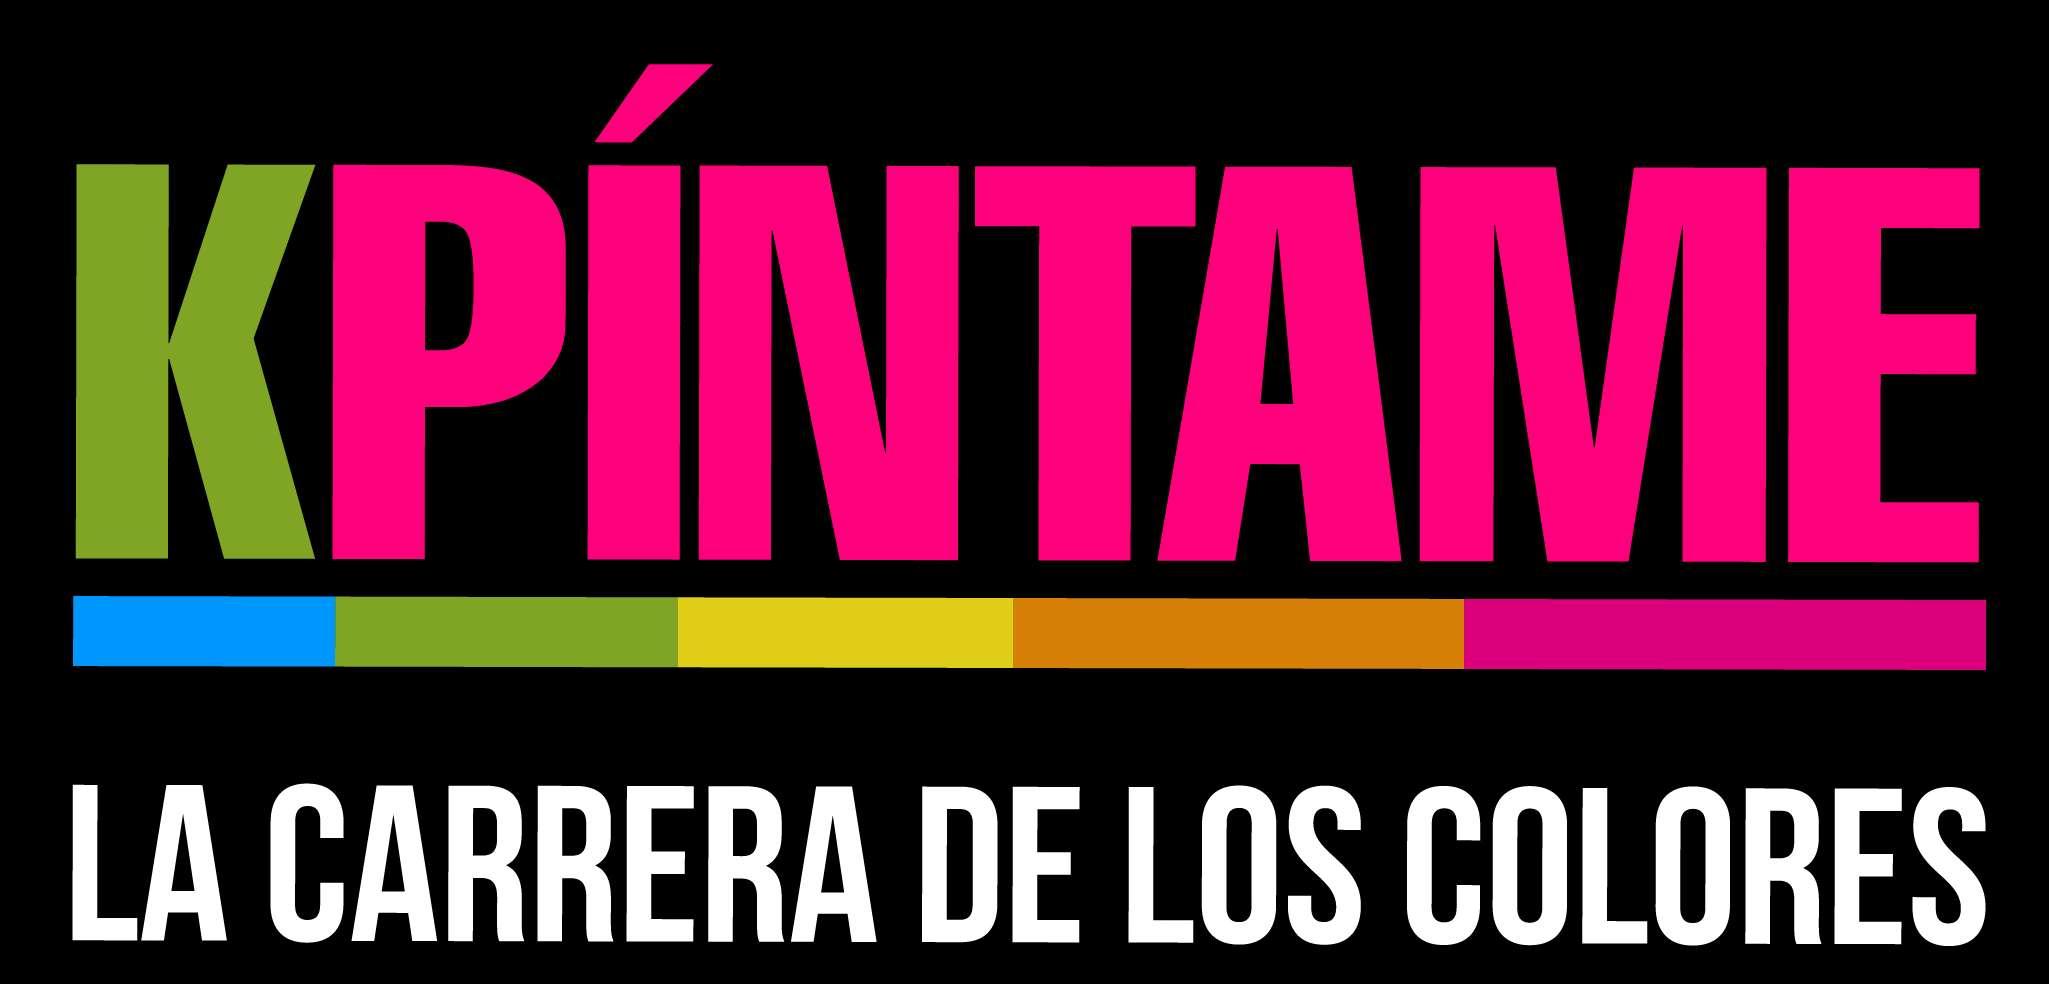 KPINTAME logo